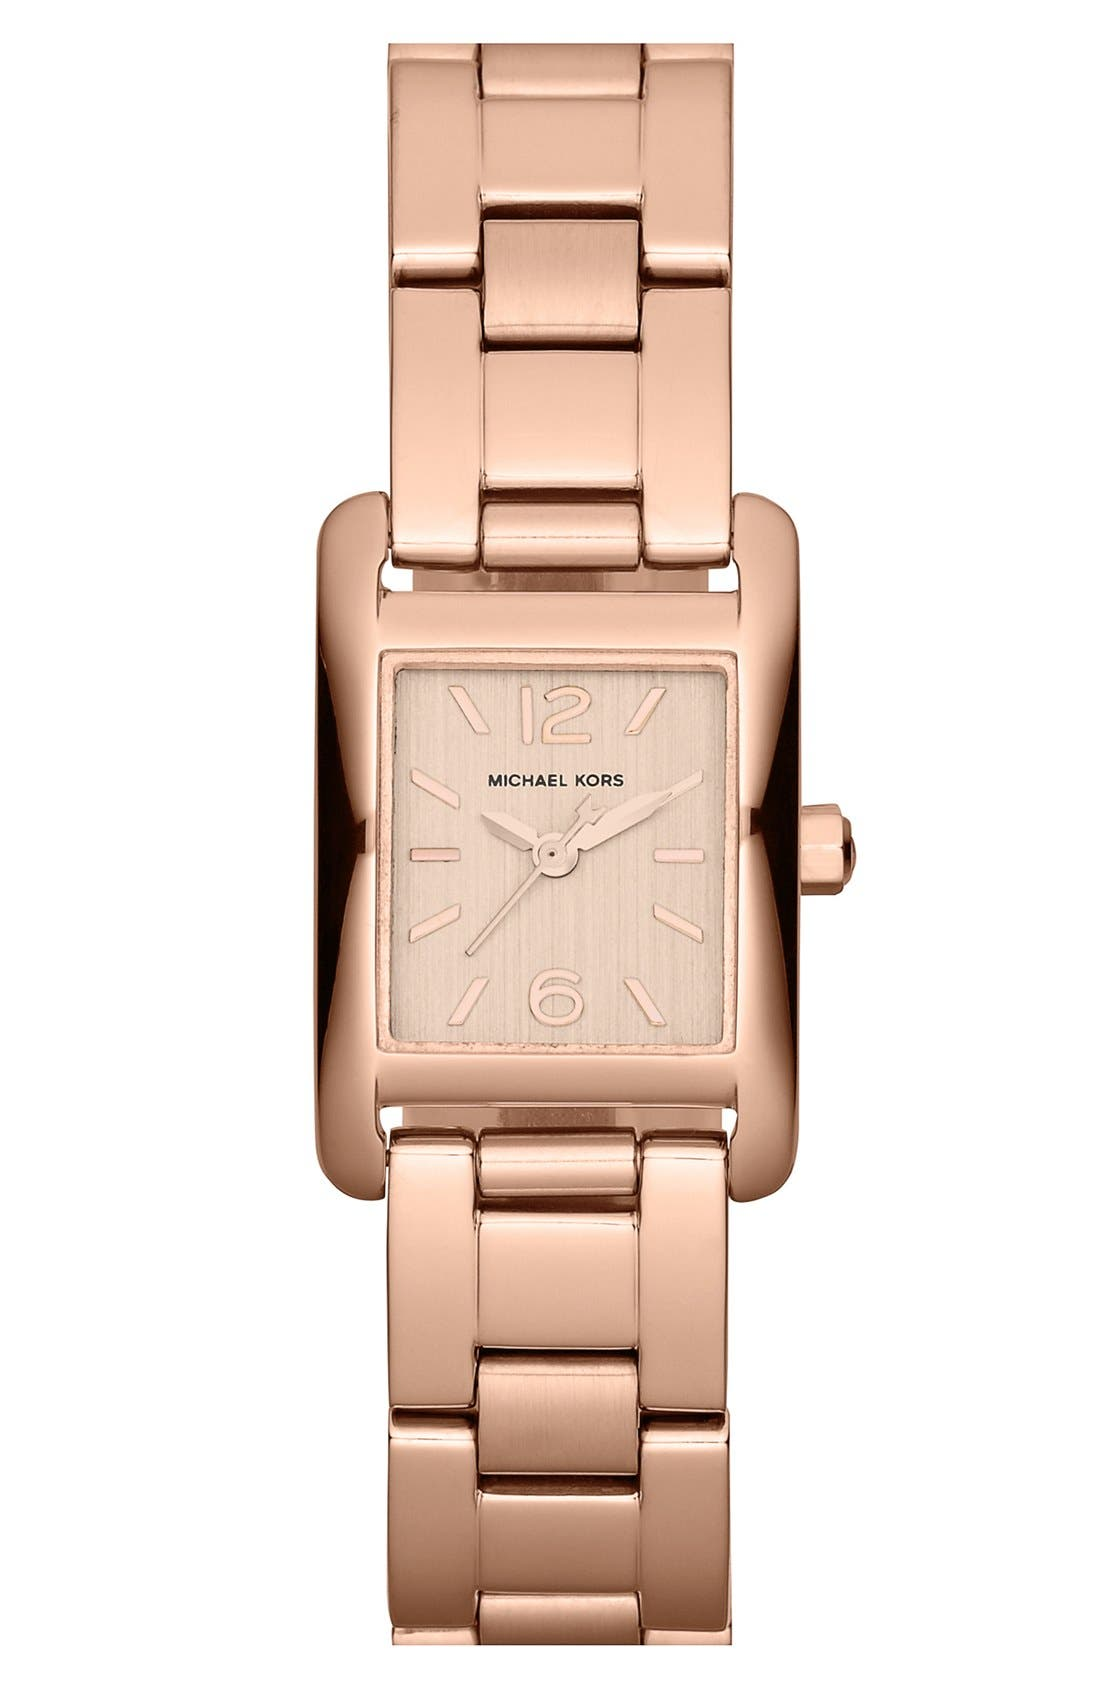 Main Image - Michael Kors 'Taylor - Mini' Rectangular Bracelet Watch, 20mm x 22mm